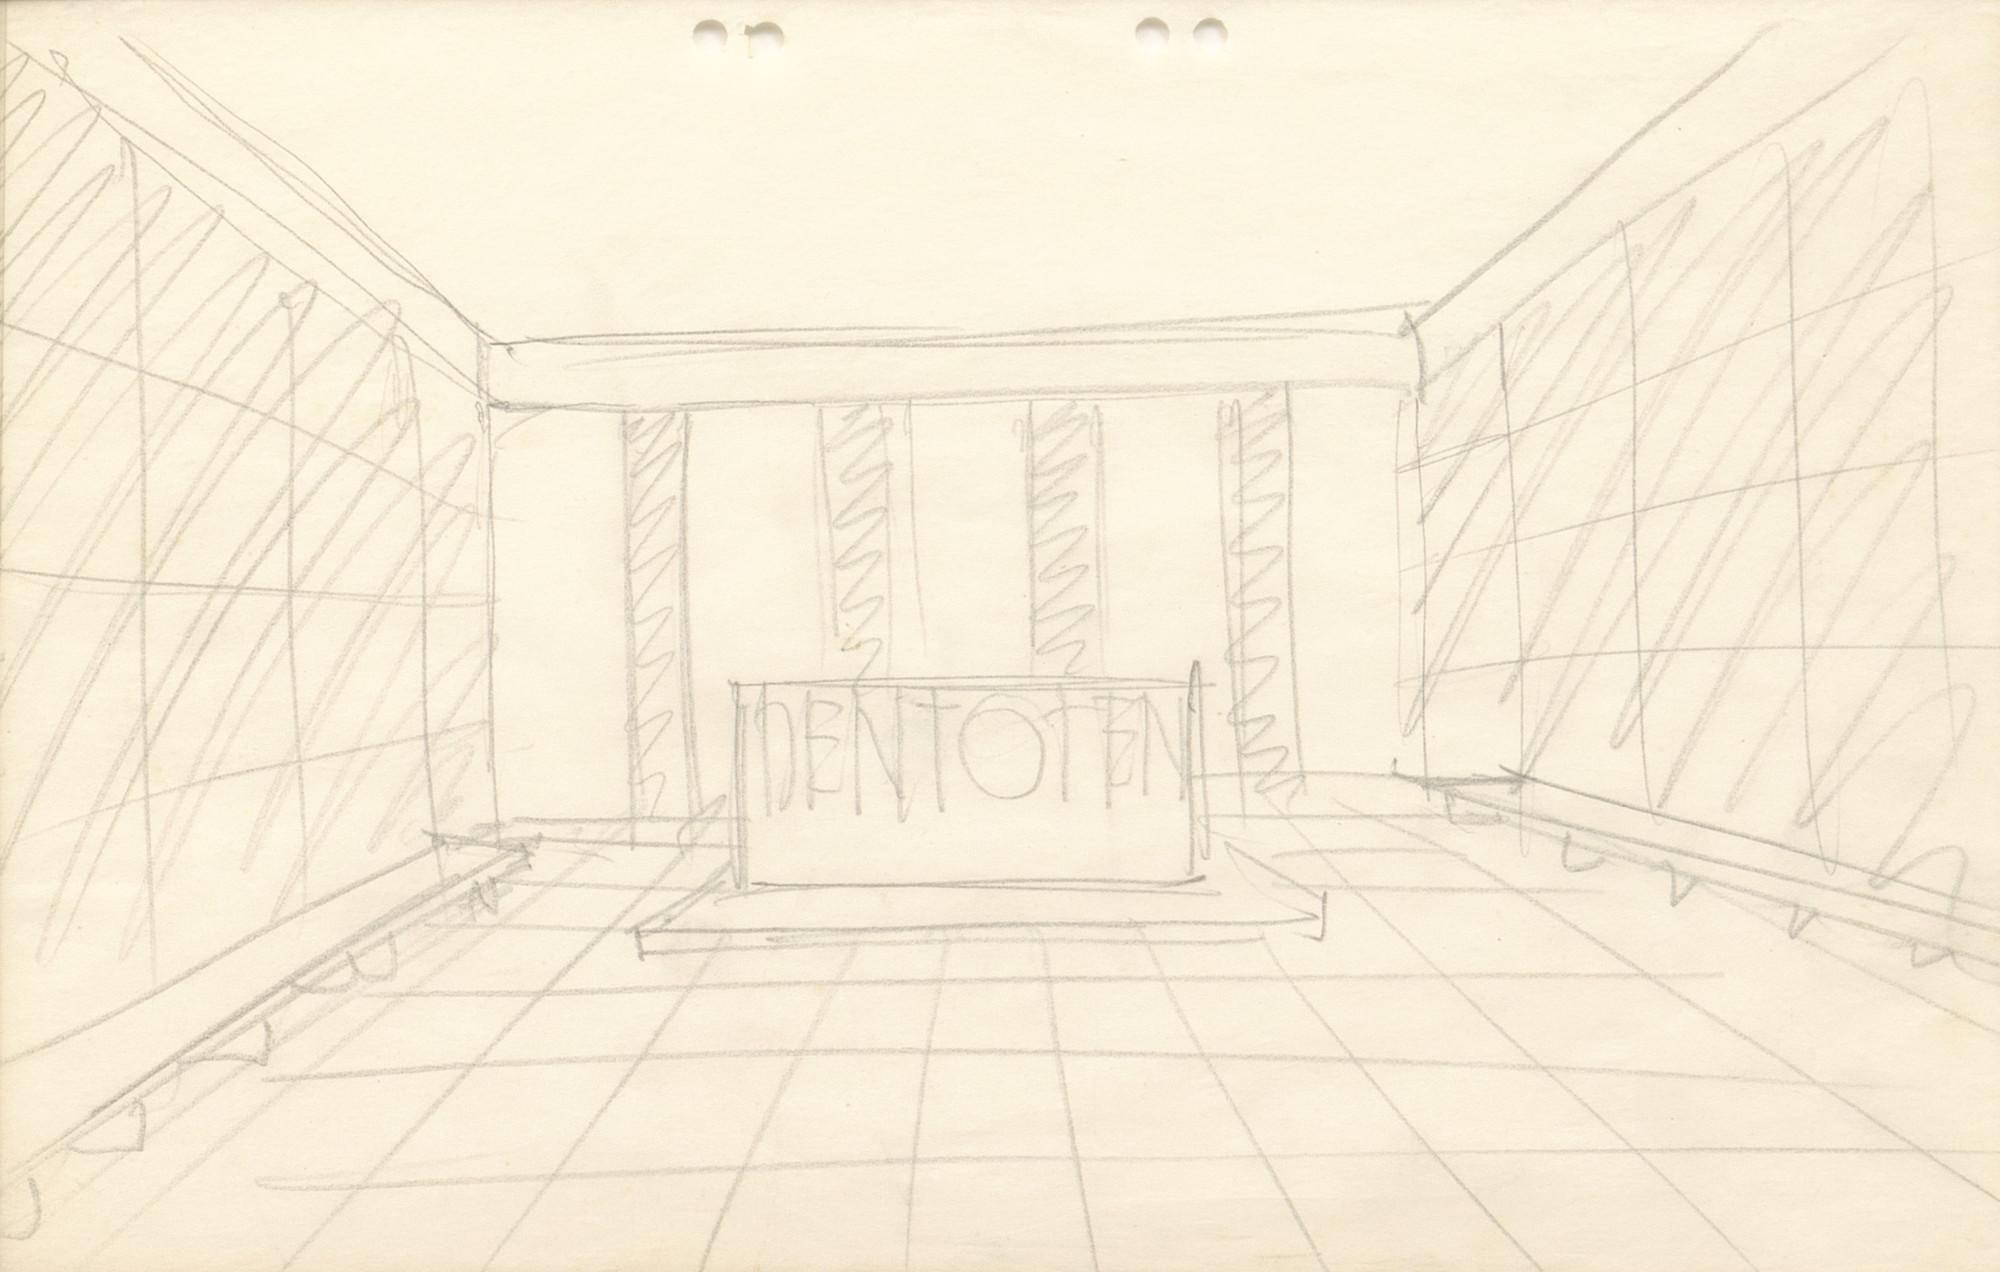 Ludwig Mies van der Rohe. Neue Wache War Memorial Project, Berlin-Mitte, Germany, Interior perspective. Sketch.. 1930 | MoMA